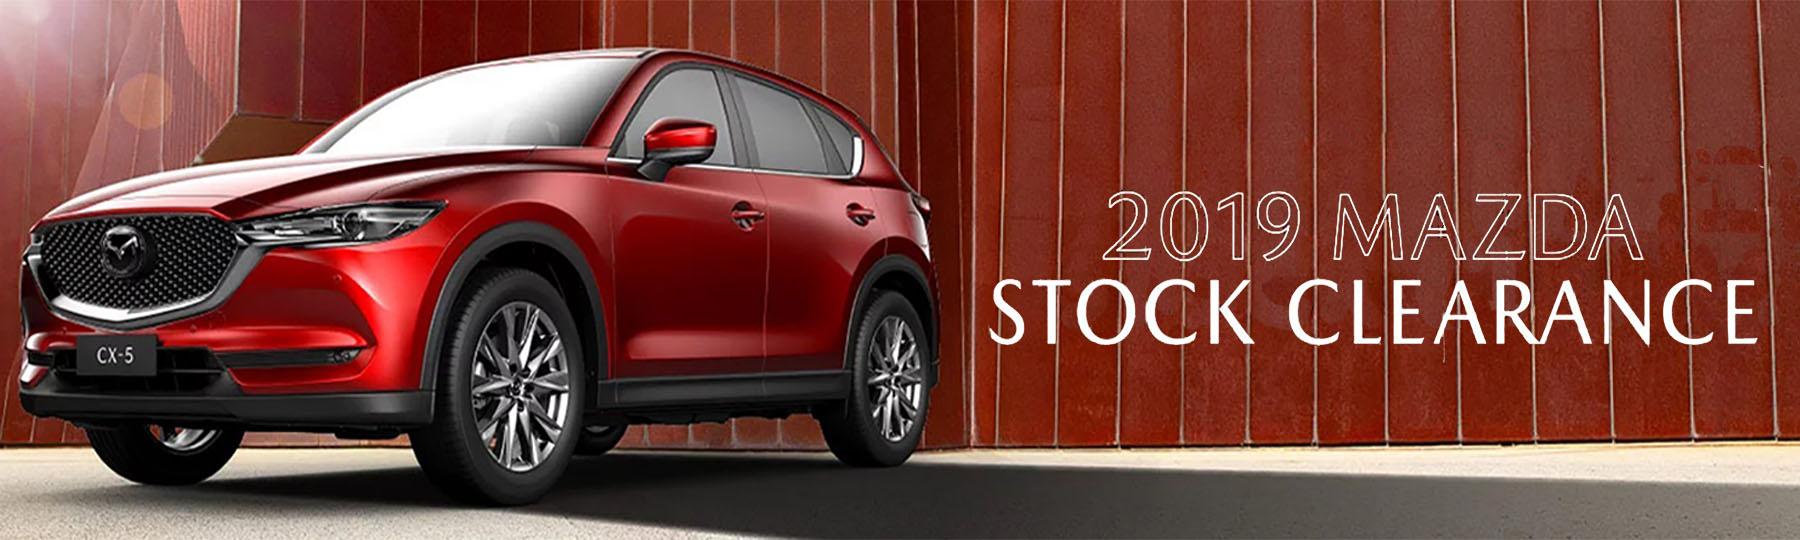 Mazda 2019 Stock Clearance